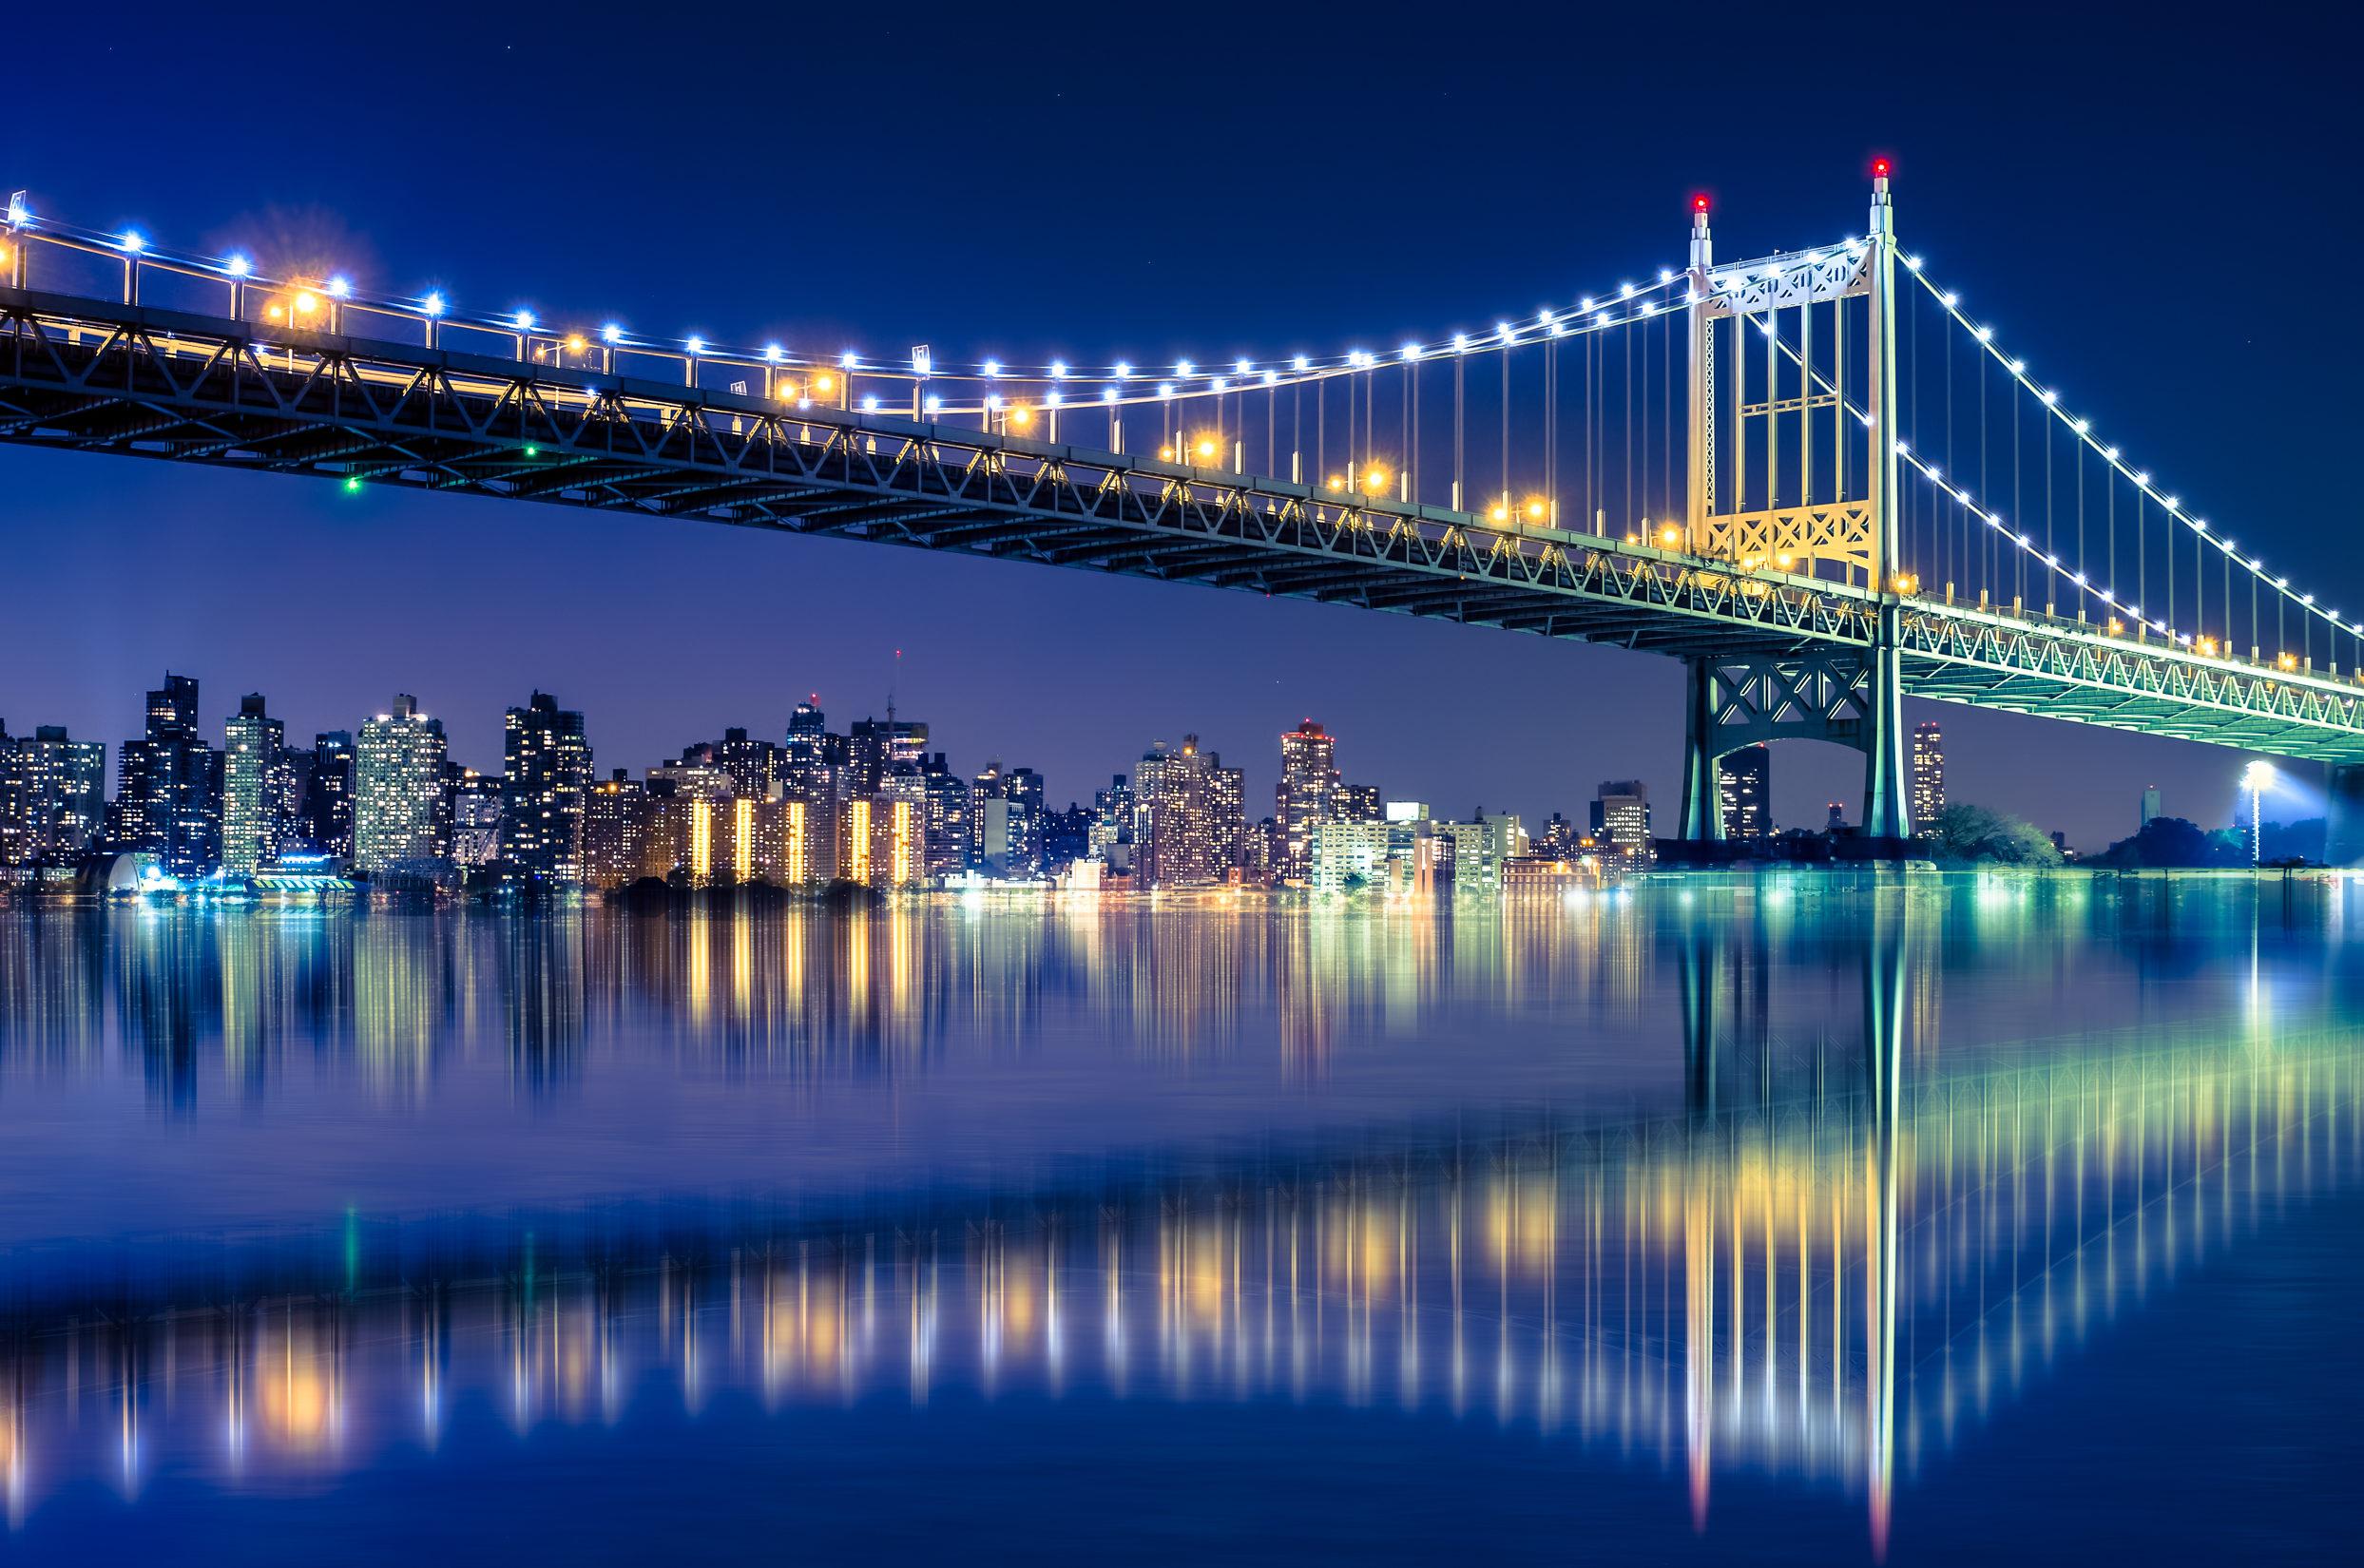 Robert F. Kennedy Bridge will go cashless beginning on June 15 - QNS.com